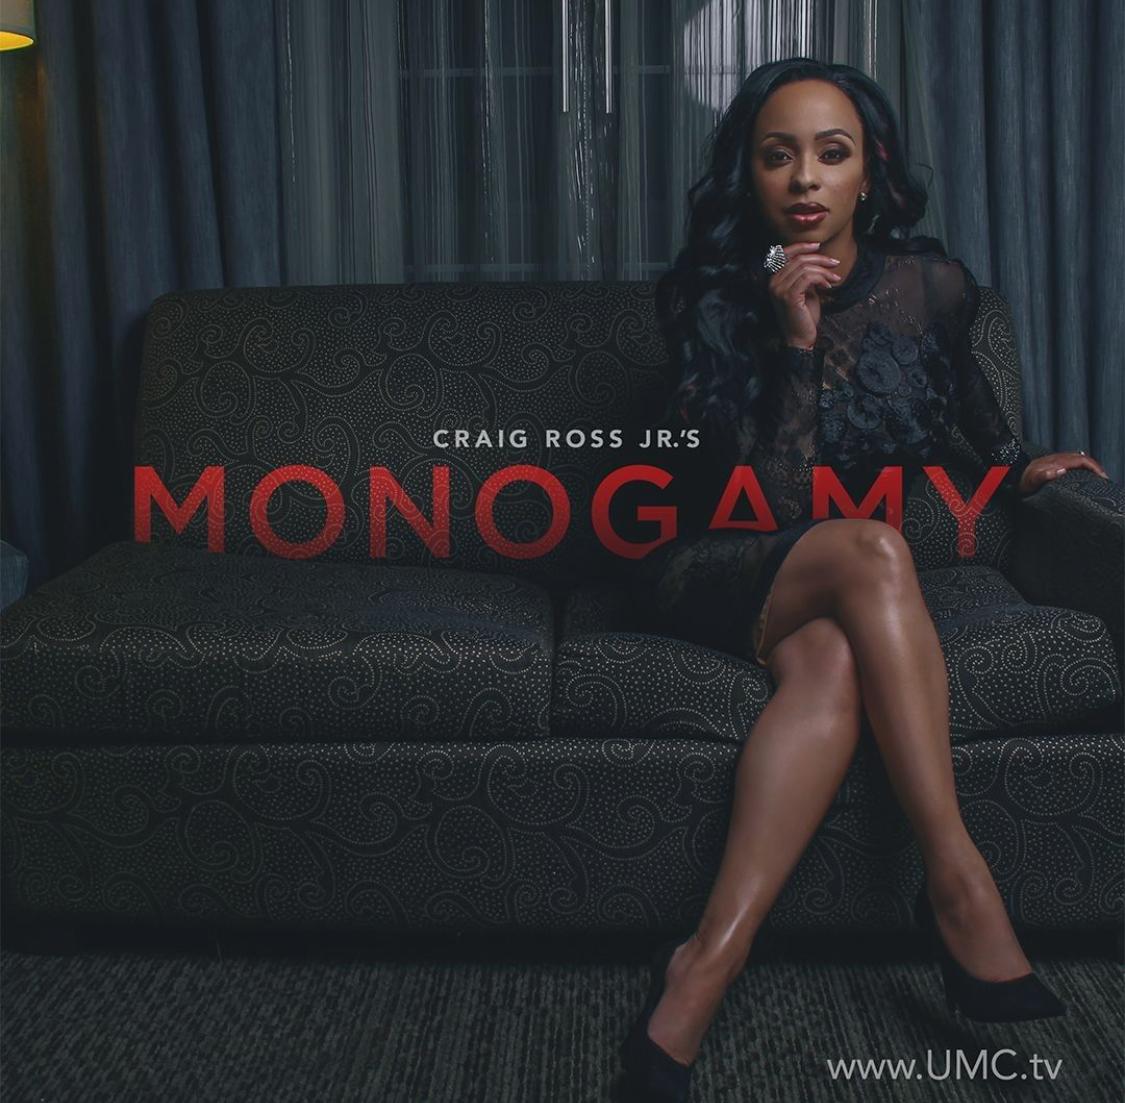 MONOGAMIJA (1 Sezonas) / CRAIG ROSS JR.'S MONOGAMY Season 1